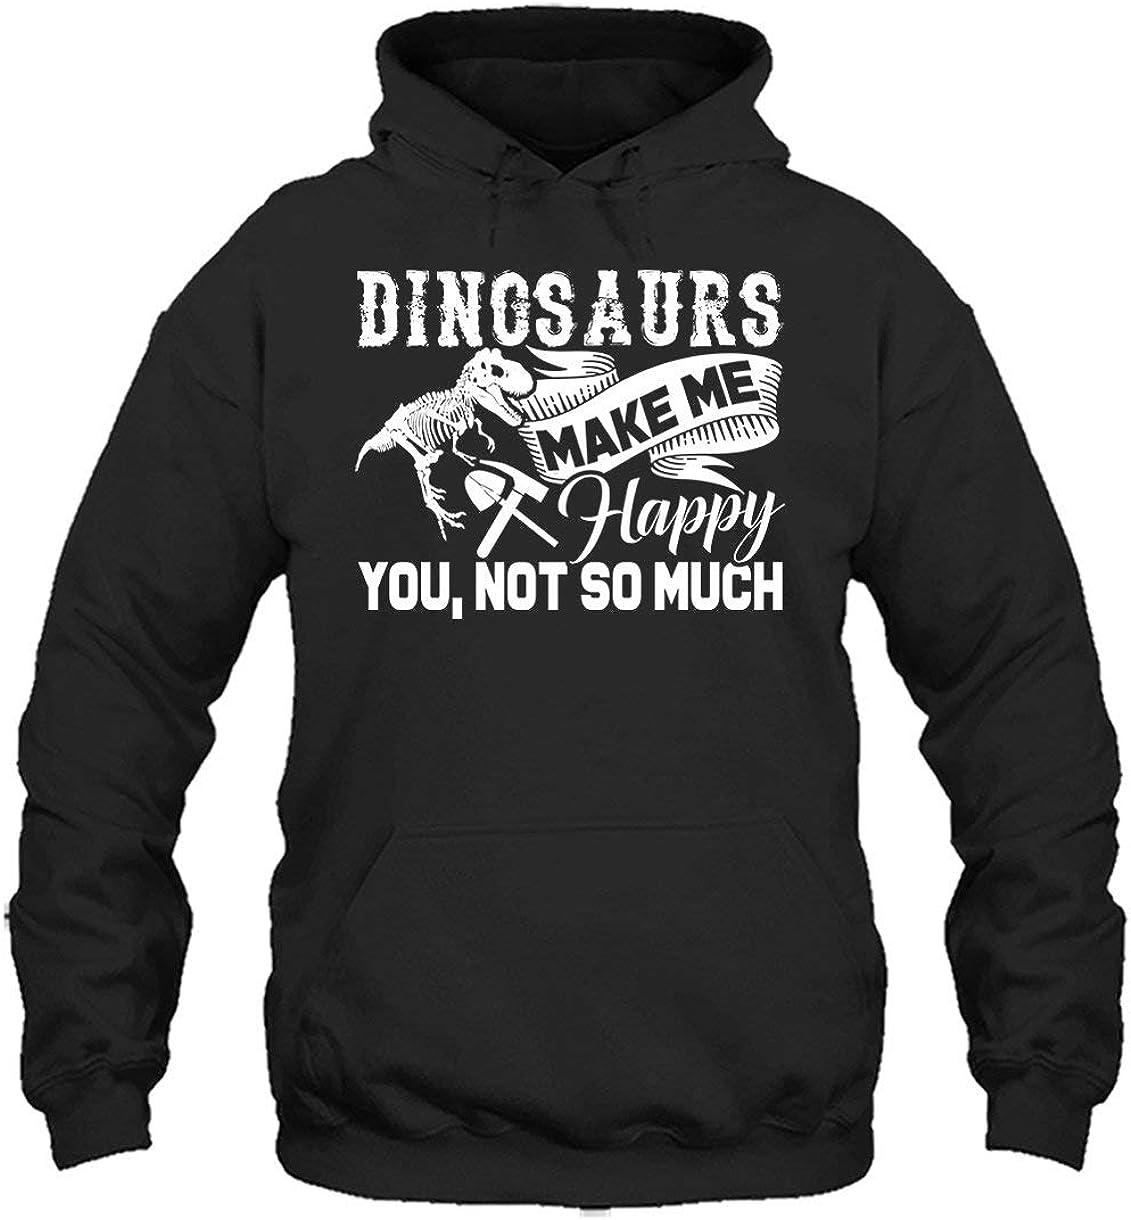 Two Camel Paleontologist Long Sleeve Hoodies Dinosaurs Make Me Happy Unisex Hoodie